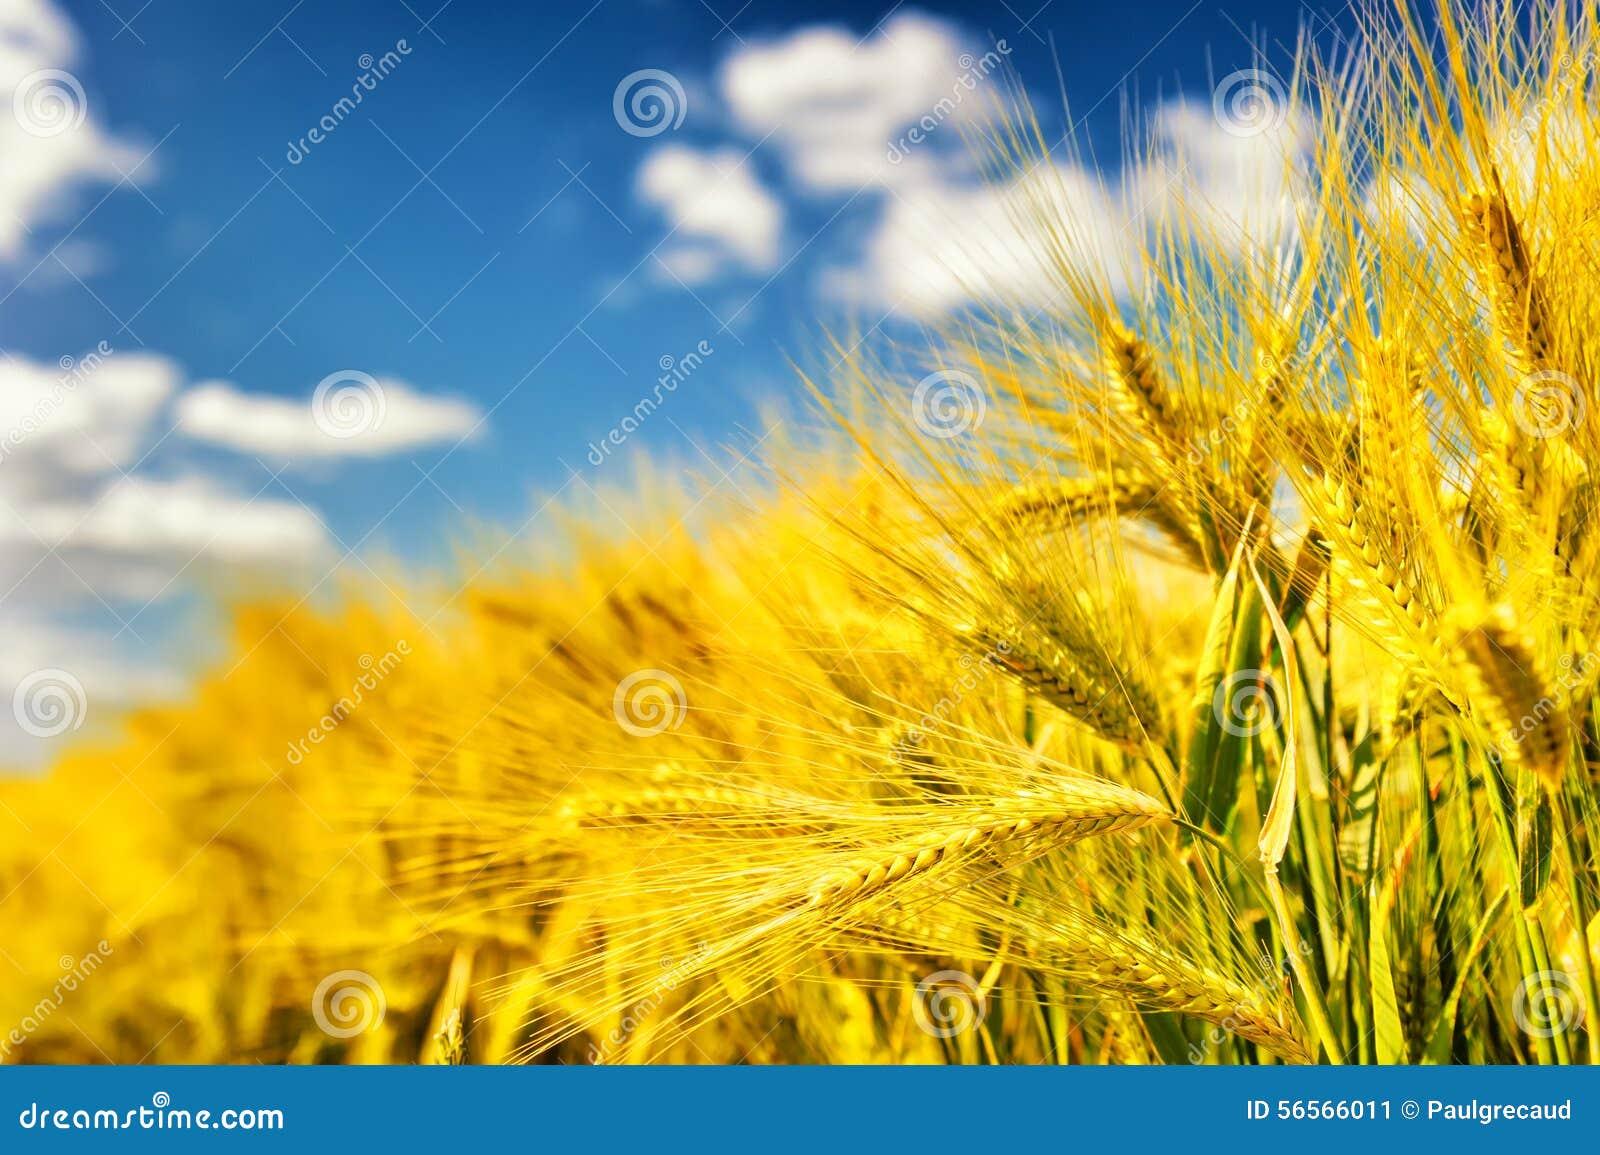 Download χρυσός σίτος πεδίων στοκ εικόνα. εικόνα από ανασκόπησης - 56566011